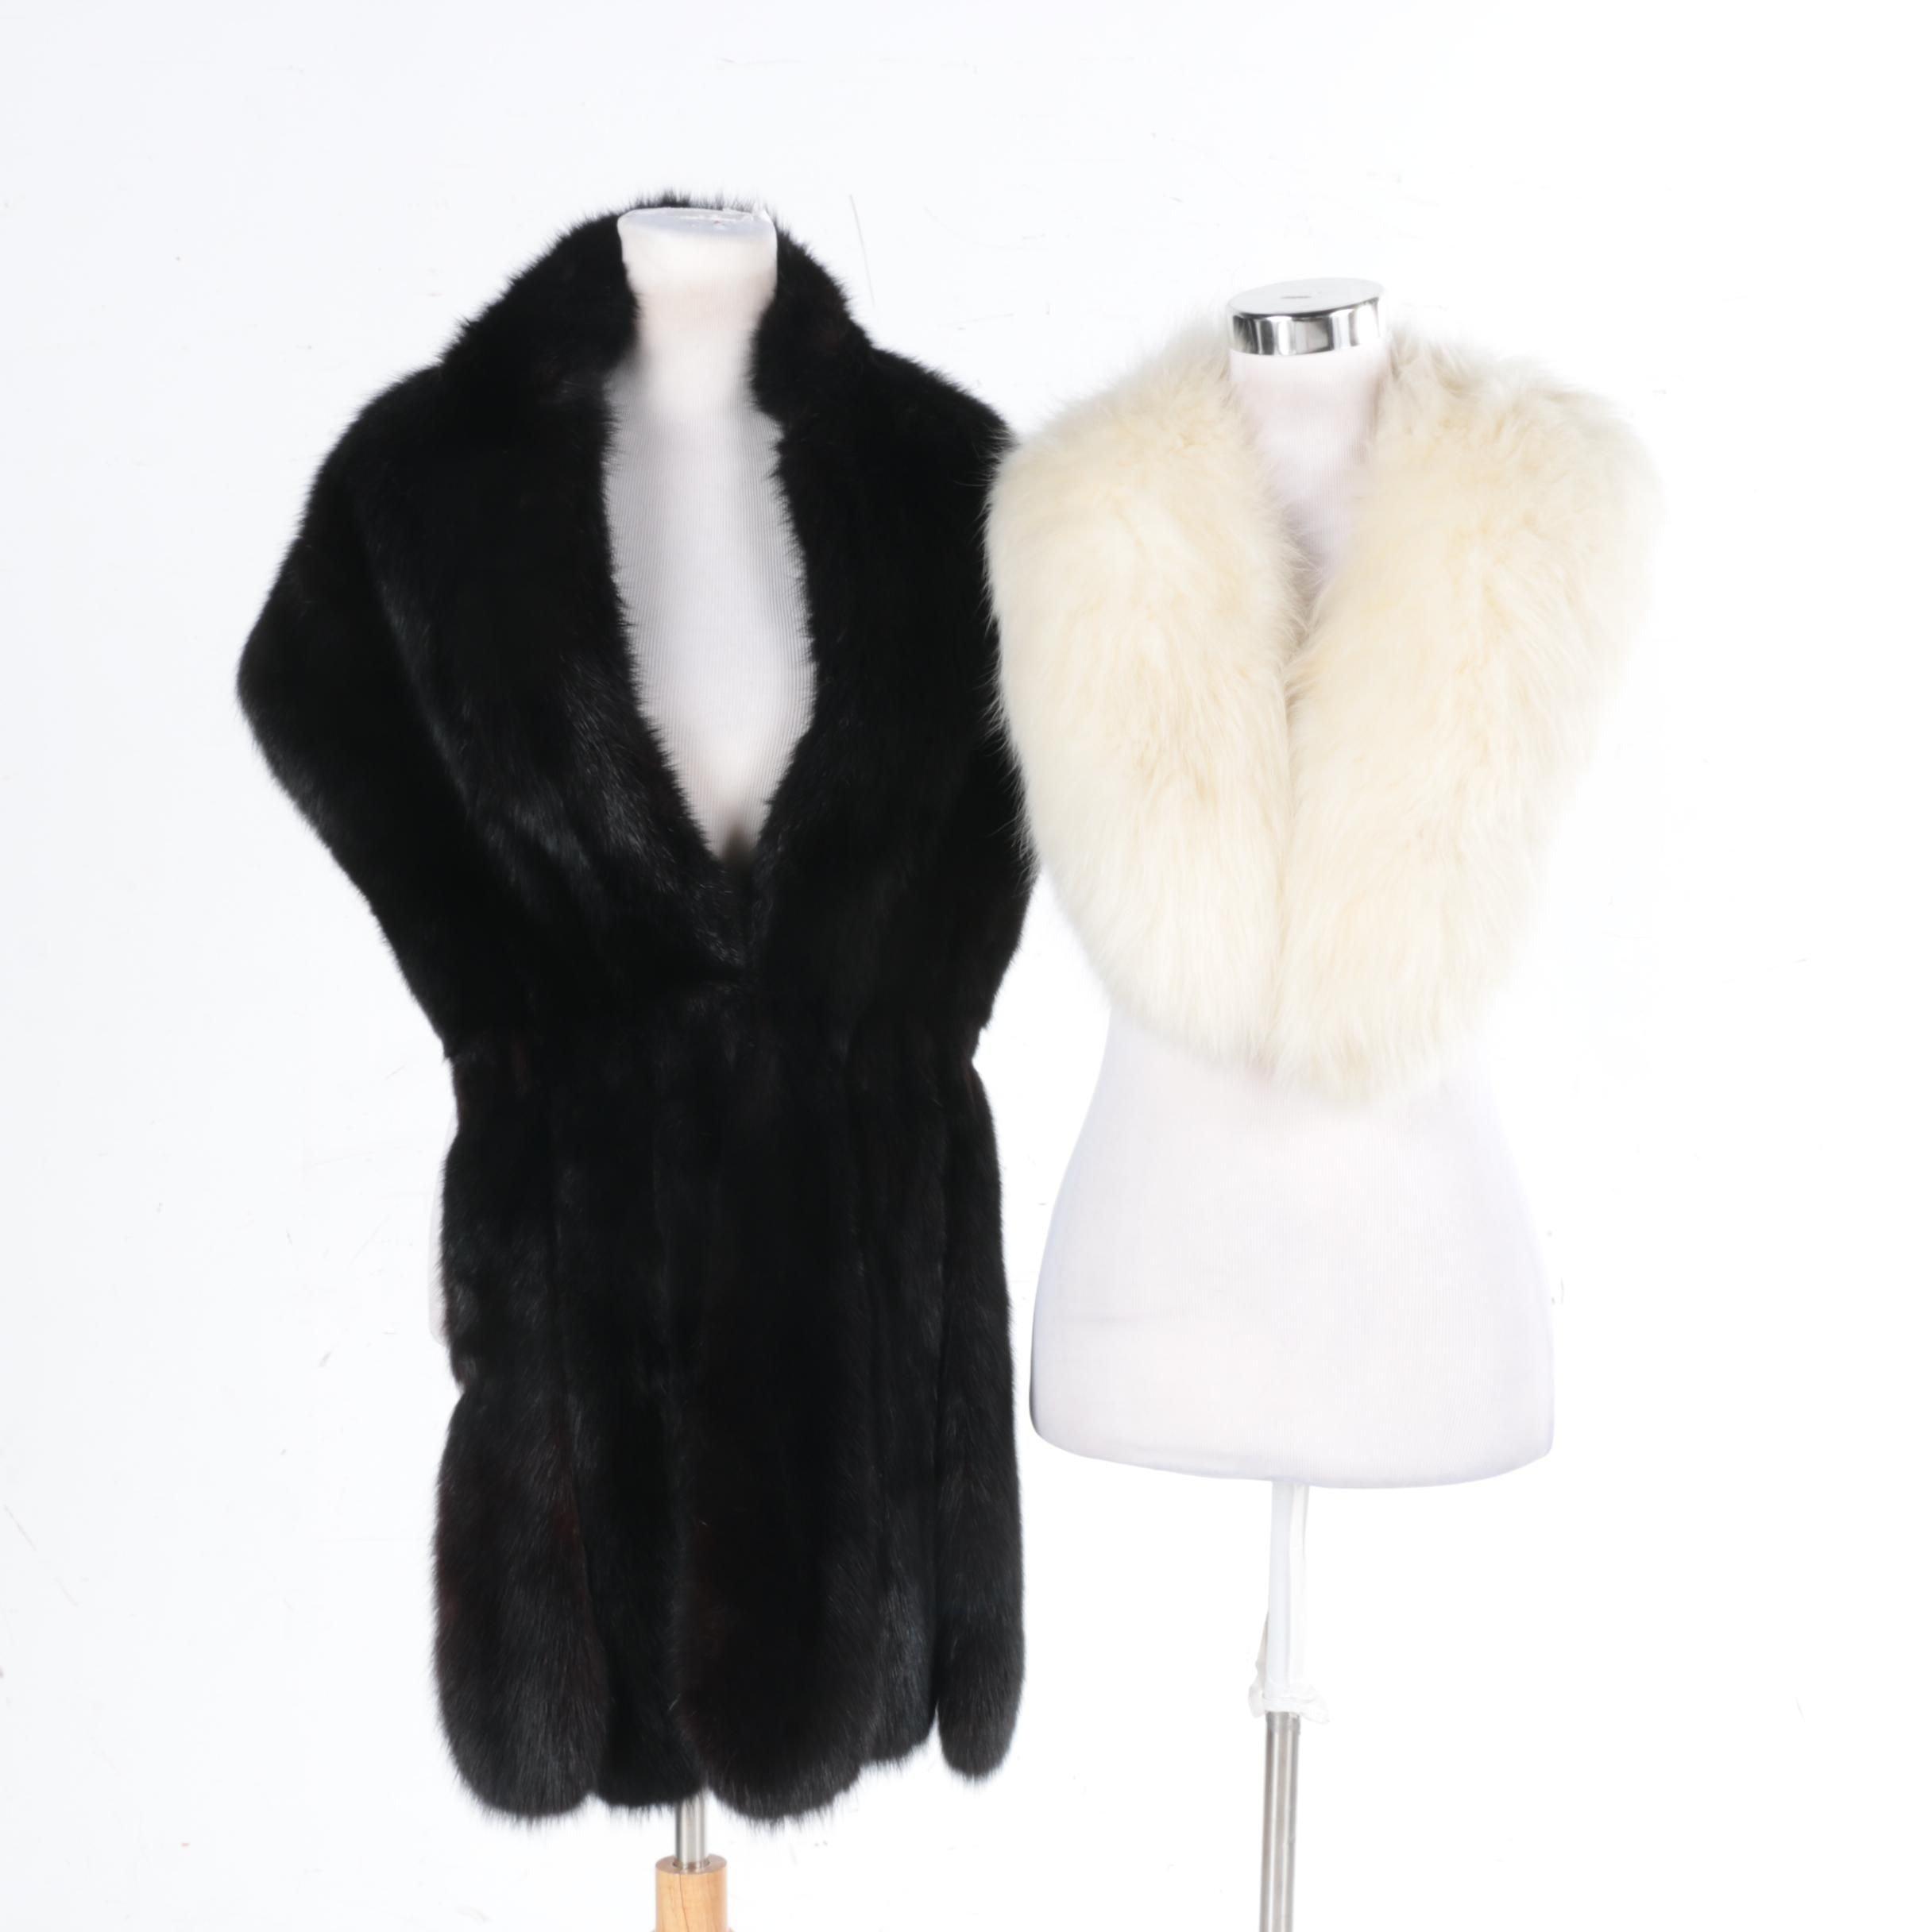 Vintage Fox Fur Collar and Dyed Marten Fur Stole